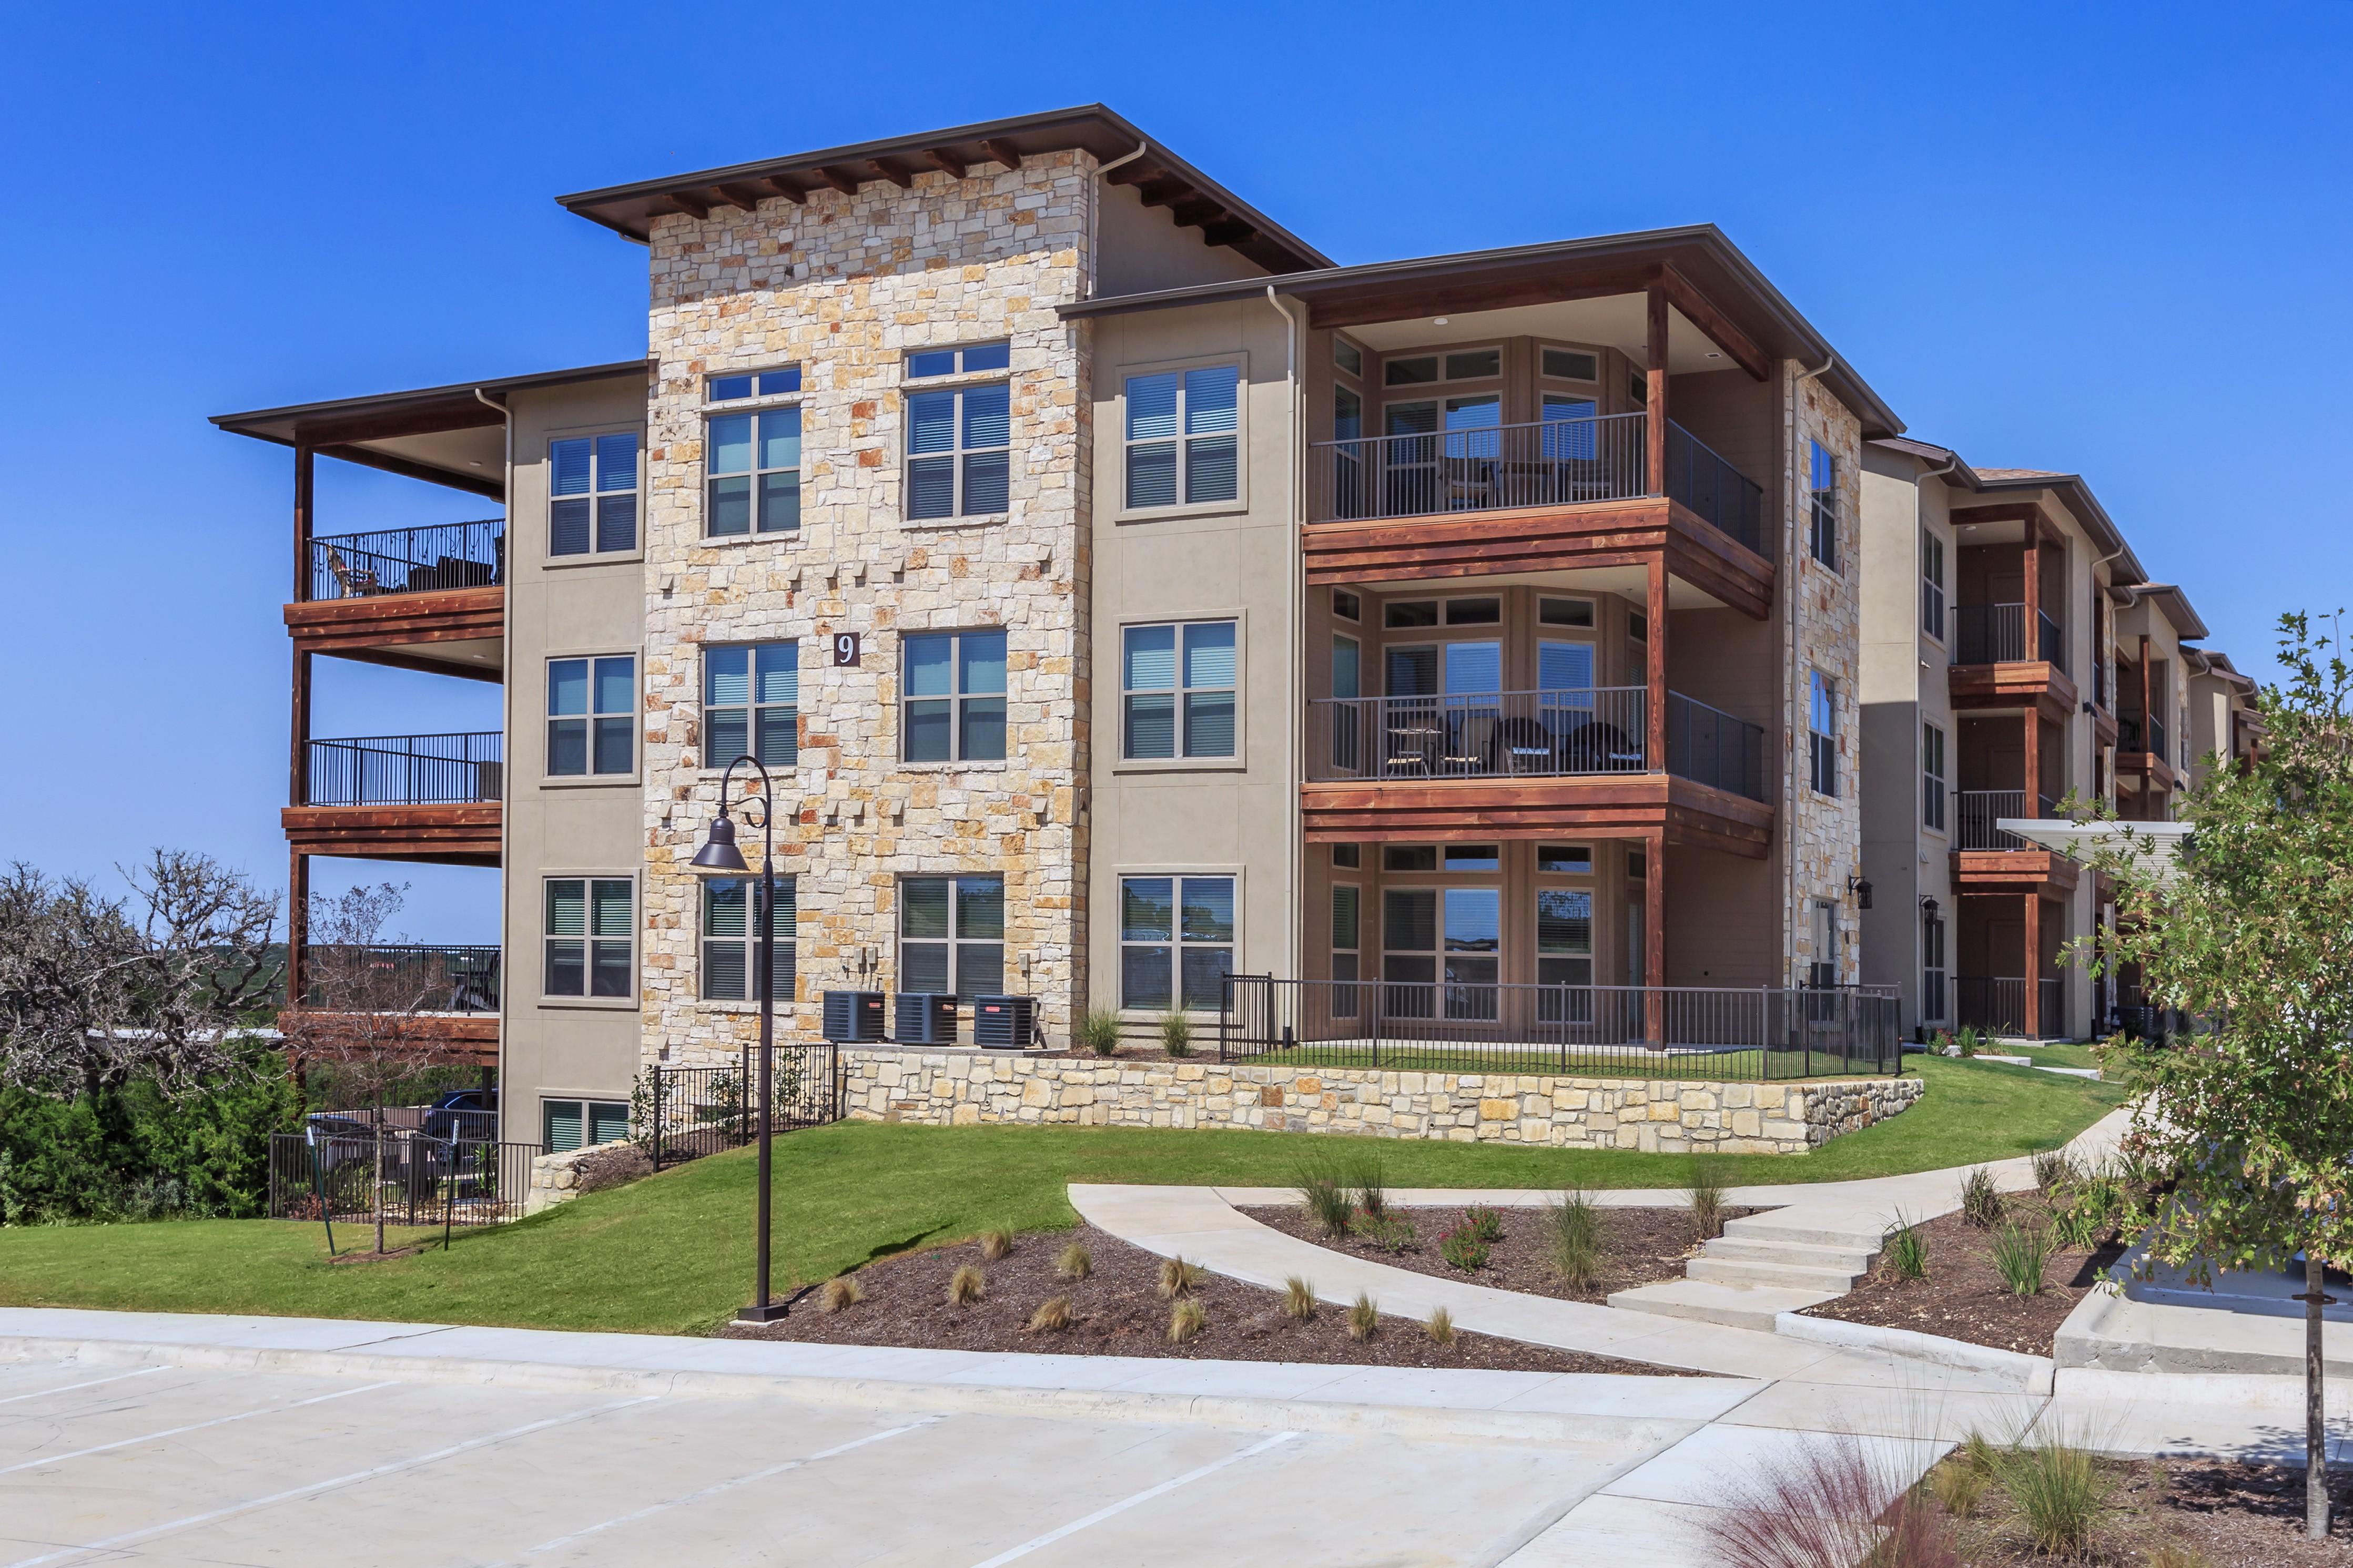 Apartments Near UT Austin Anthem at Ledge Stone for University of Texas - Austin Students in Austin, TX